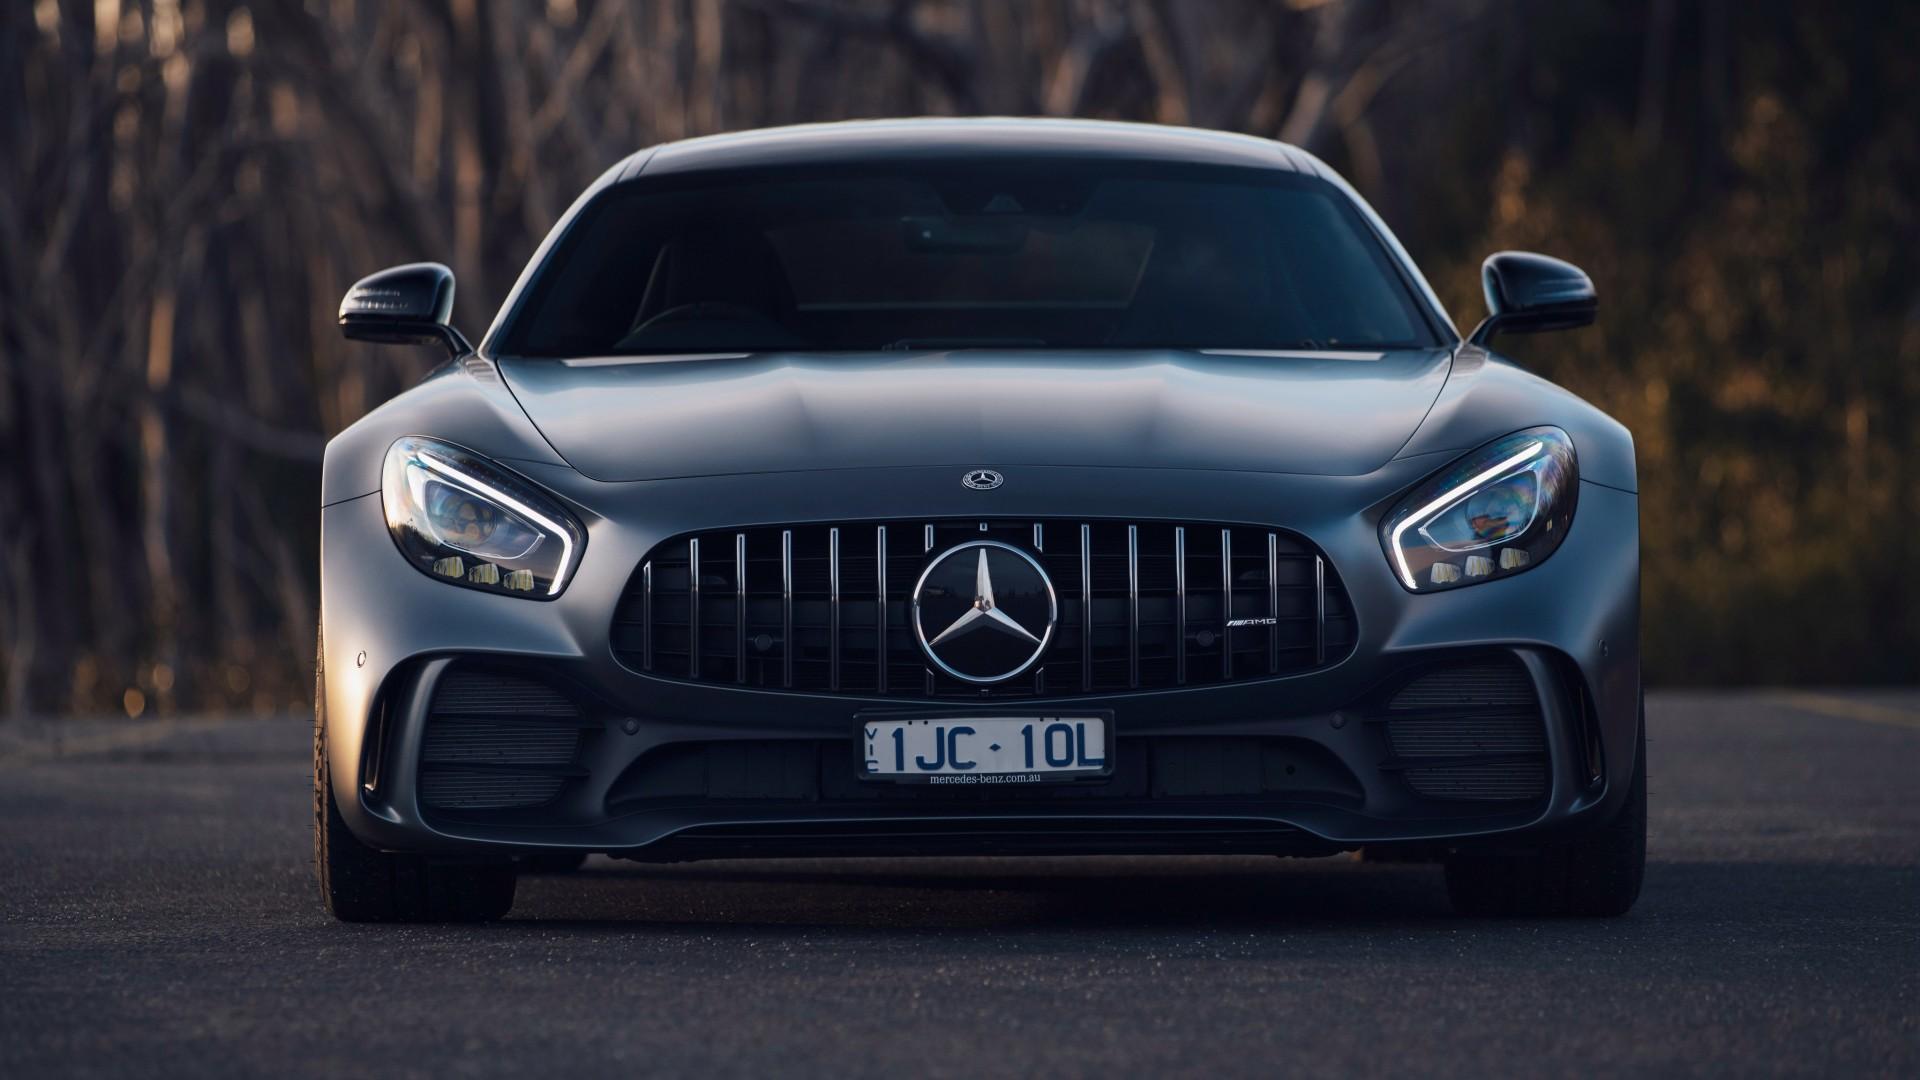 Mercedes AMG GT R 2018 4K Wallpaper | HD Car Wallpapers ...